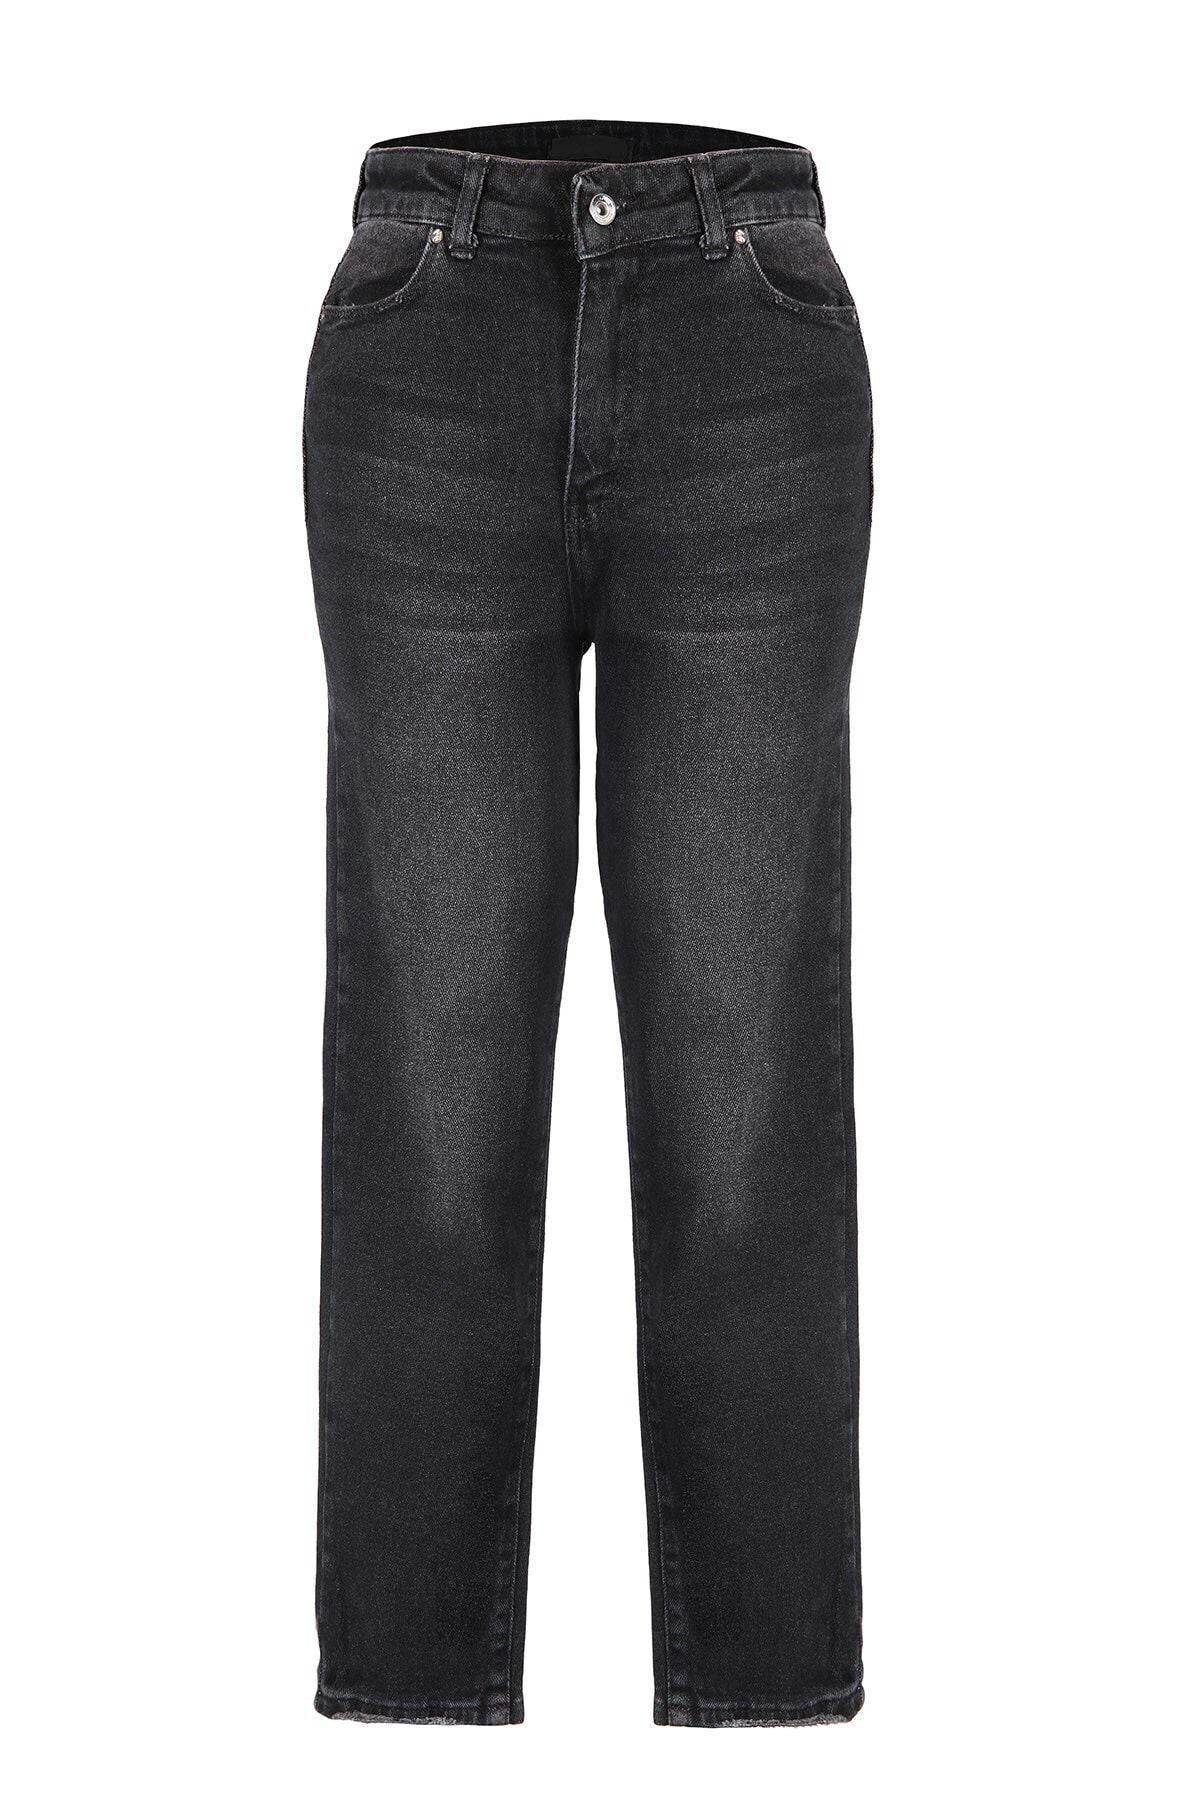 Oblavion Kadın Siyah Mom Jeans 1